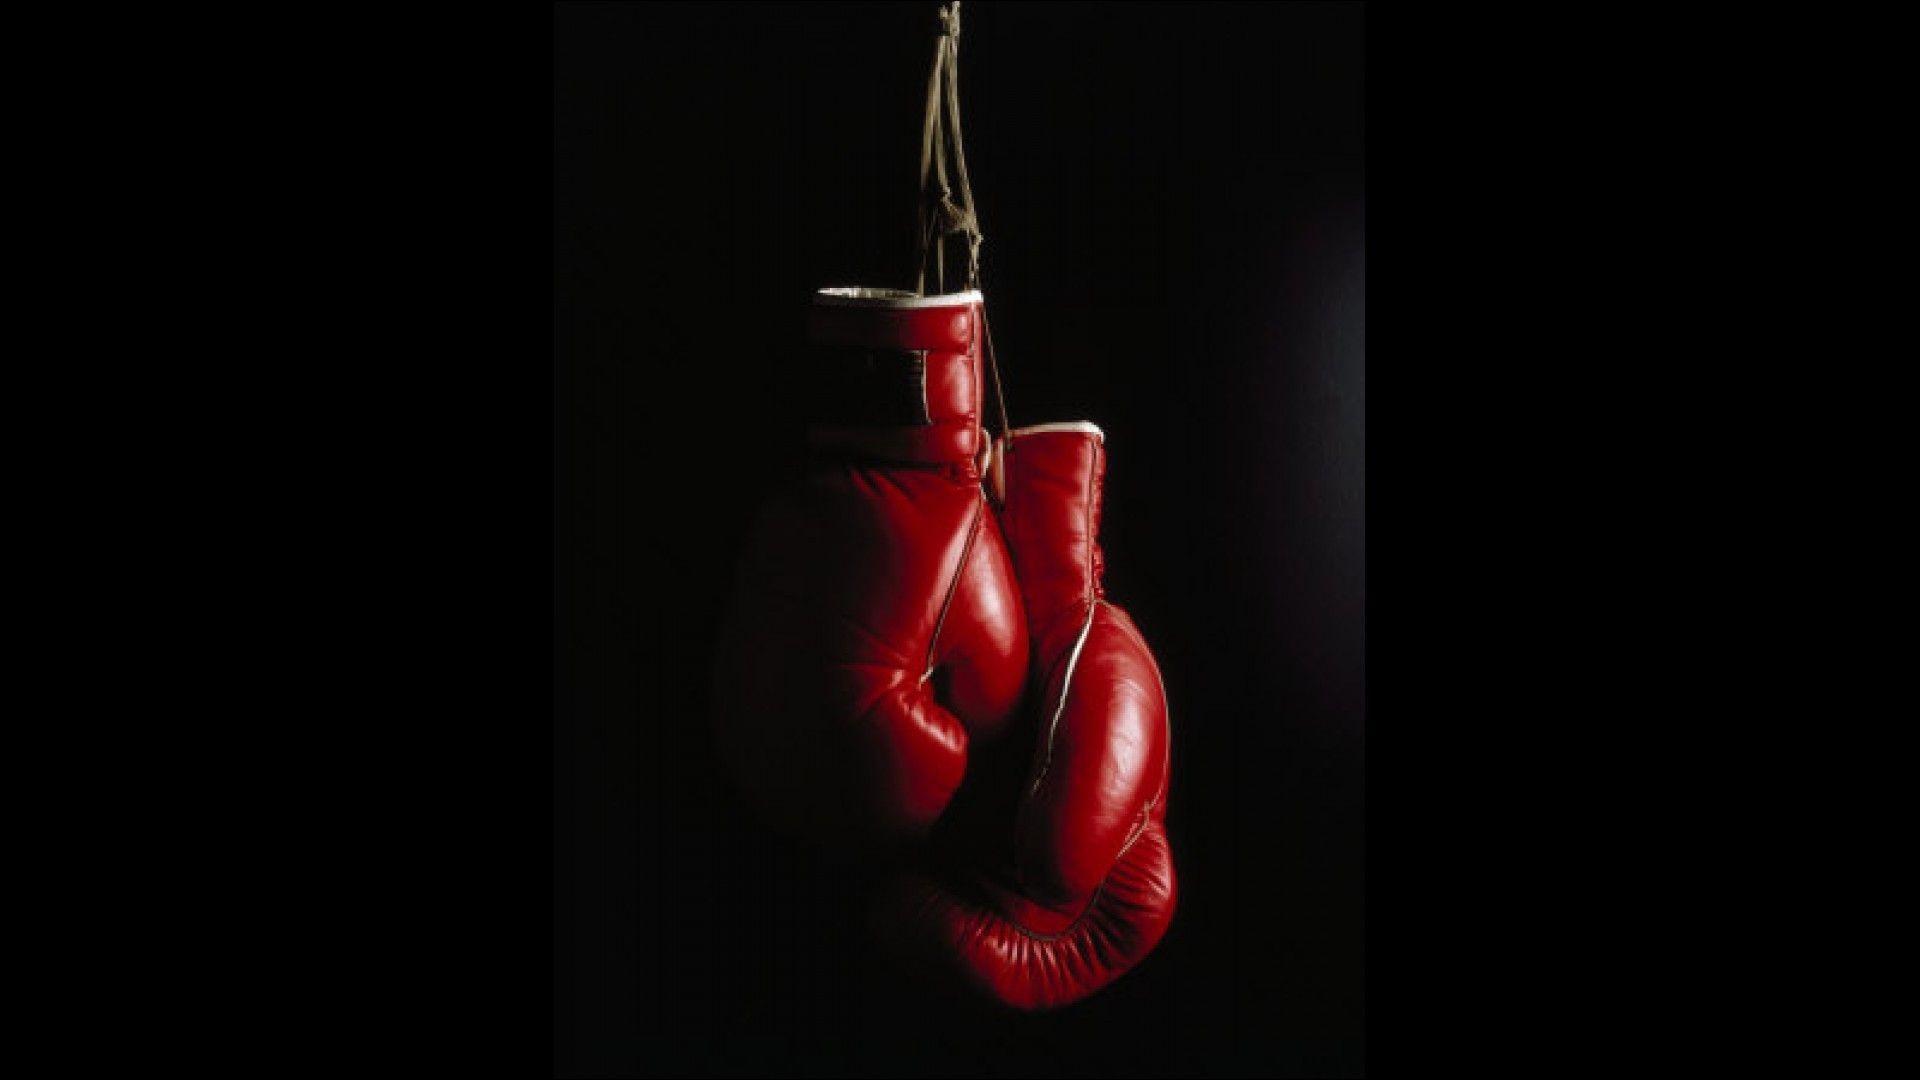 backgrounds-for-everlast-boxing-gloves-wallpaper-boxing-gloves-